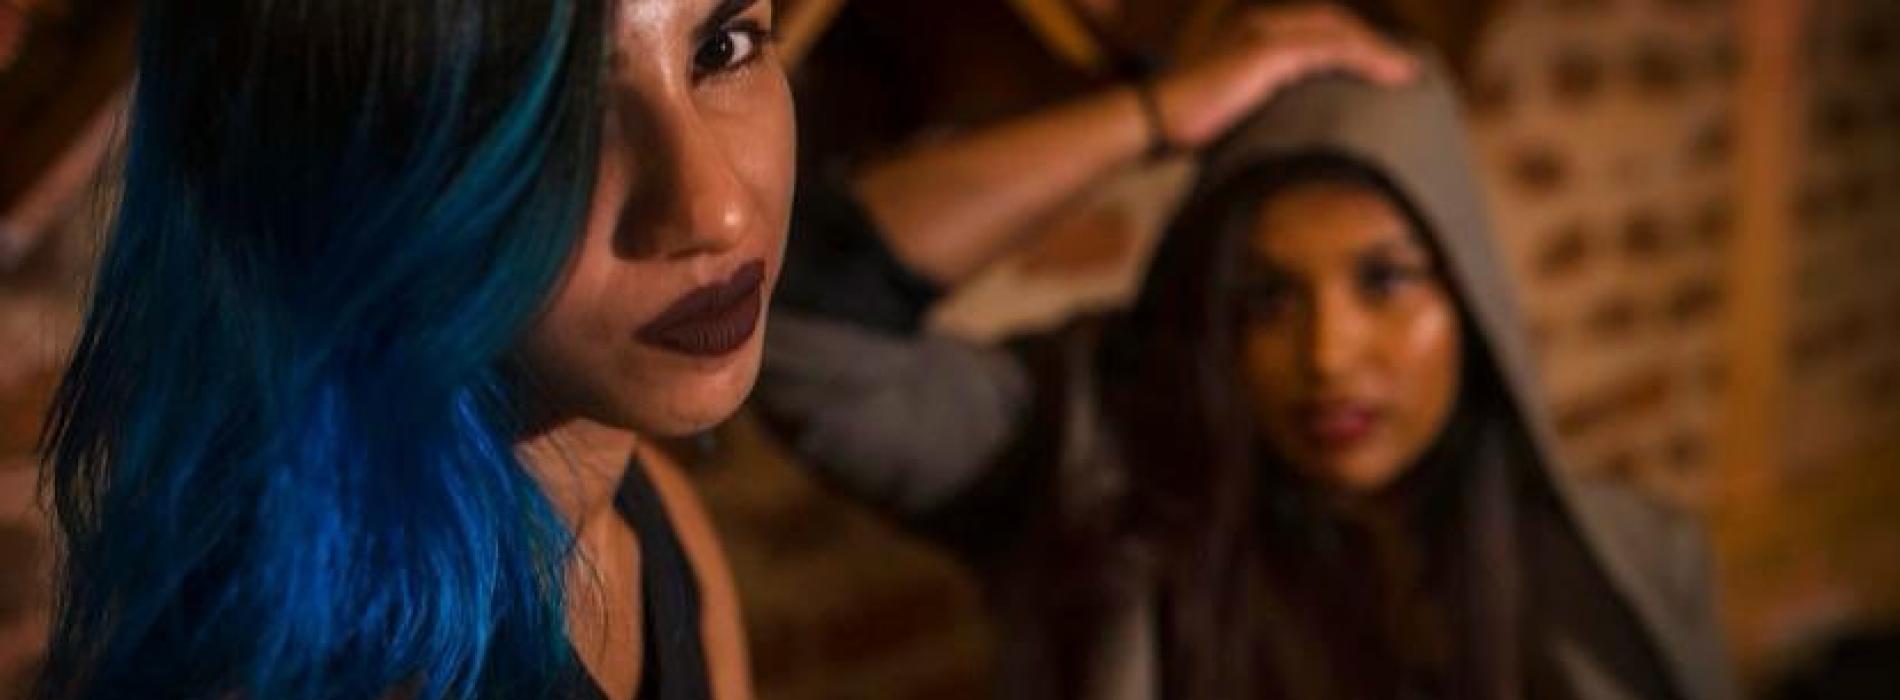 New Music : Jay Z/ Linkin Park – Dirt Off Your Shoulder | 99 Problems (Mash Up) Melissa Stephen Ft Shehara